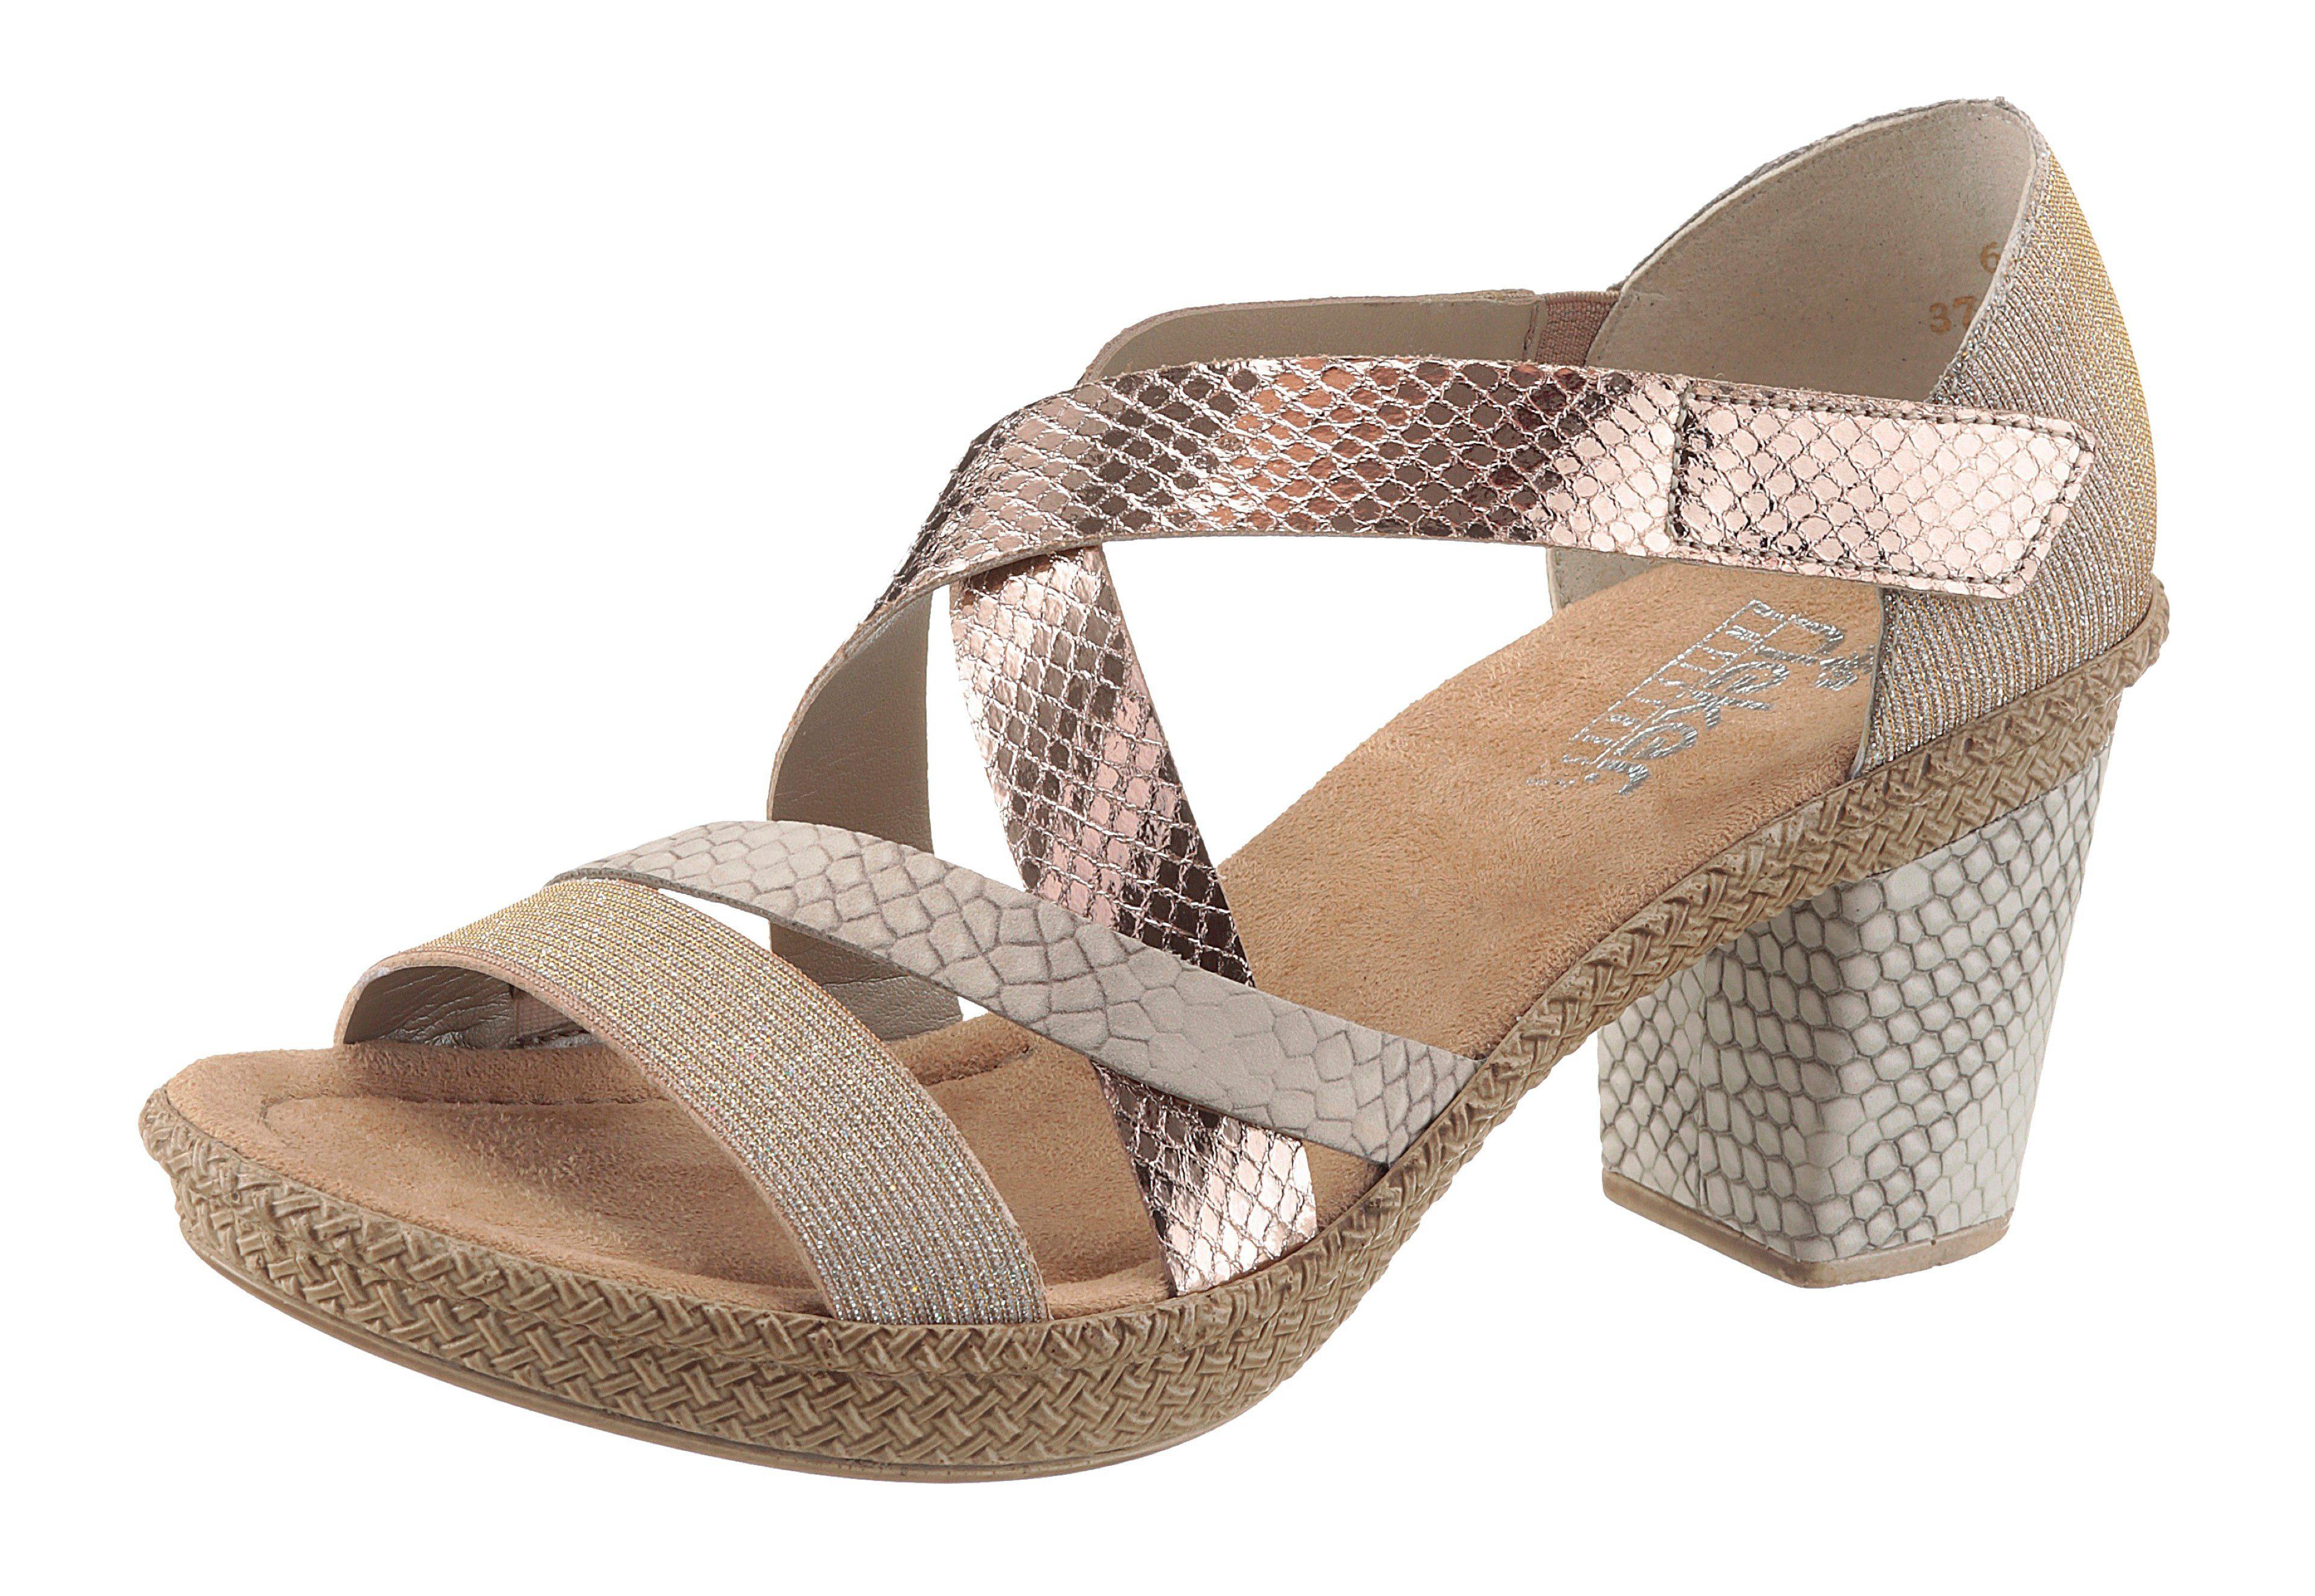 Rieker Sandalette, im Reptil-Look online kaufen  goldfarben-kupfer